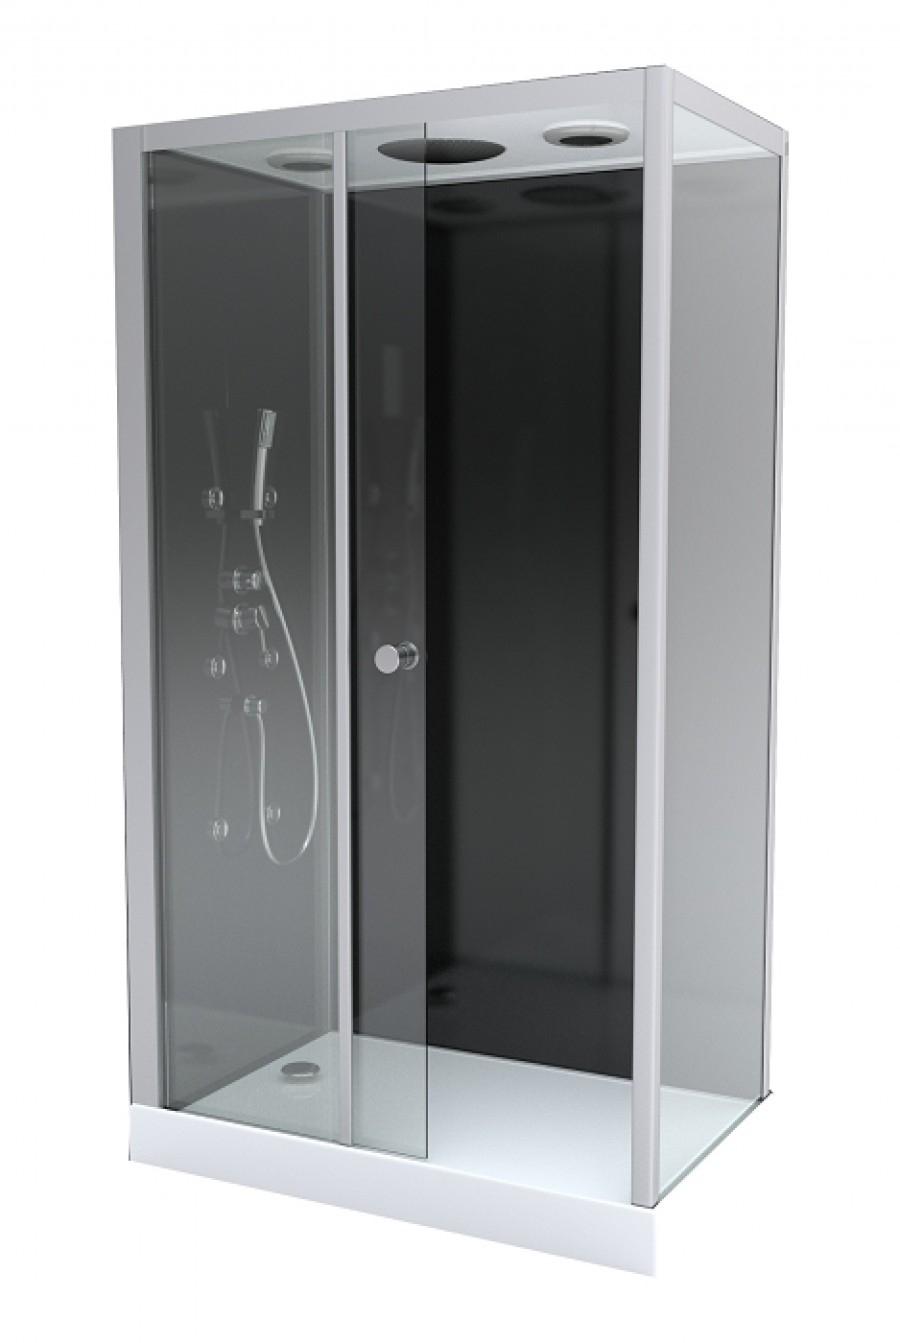 Cabine de douche rectangulaire black zen 2 - Cabine de douche rectangulaire 110 x 80 ...